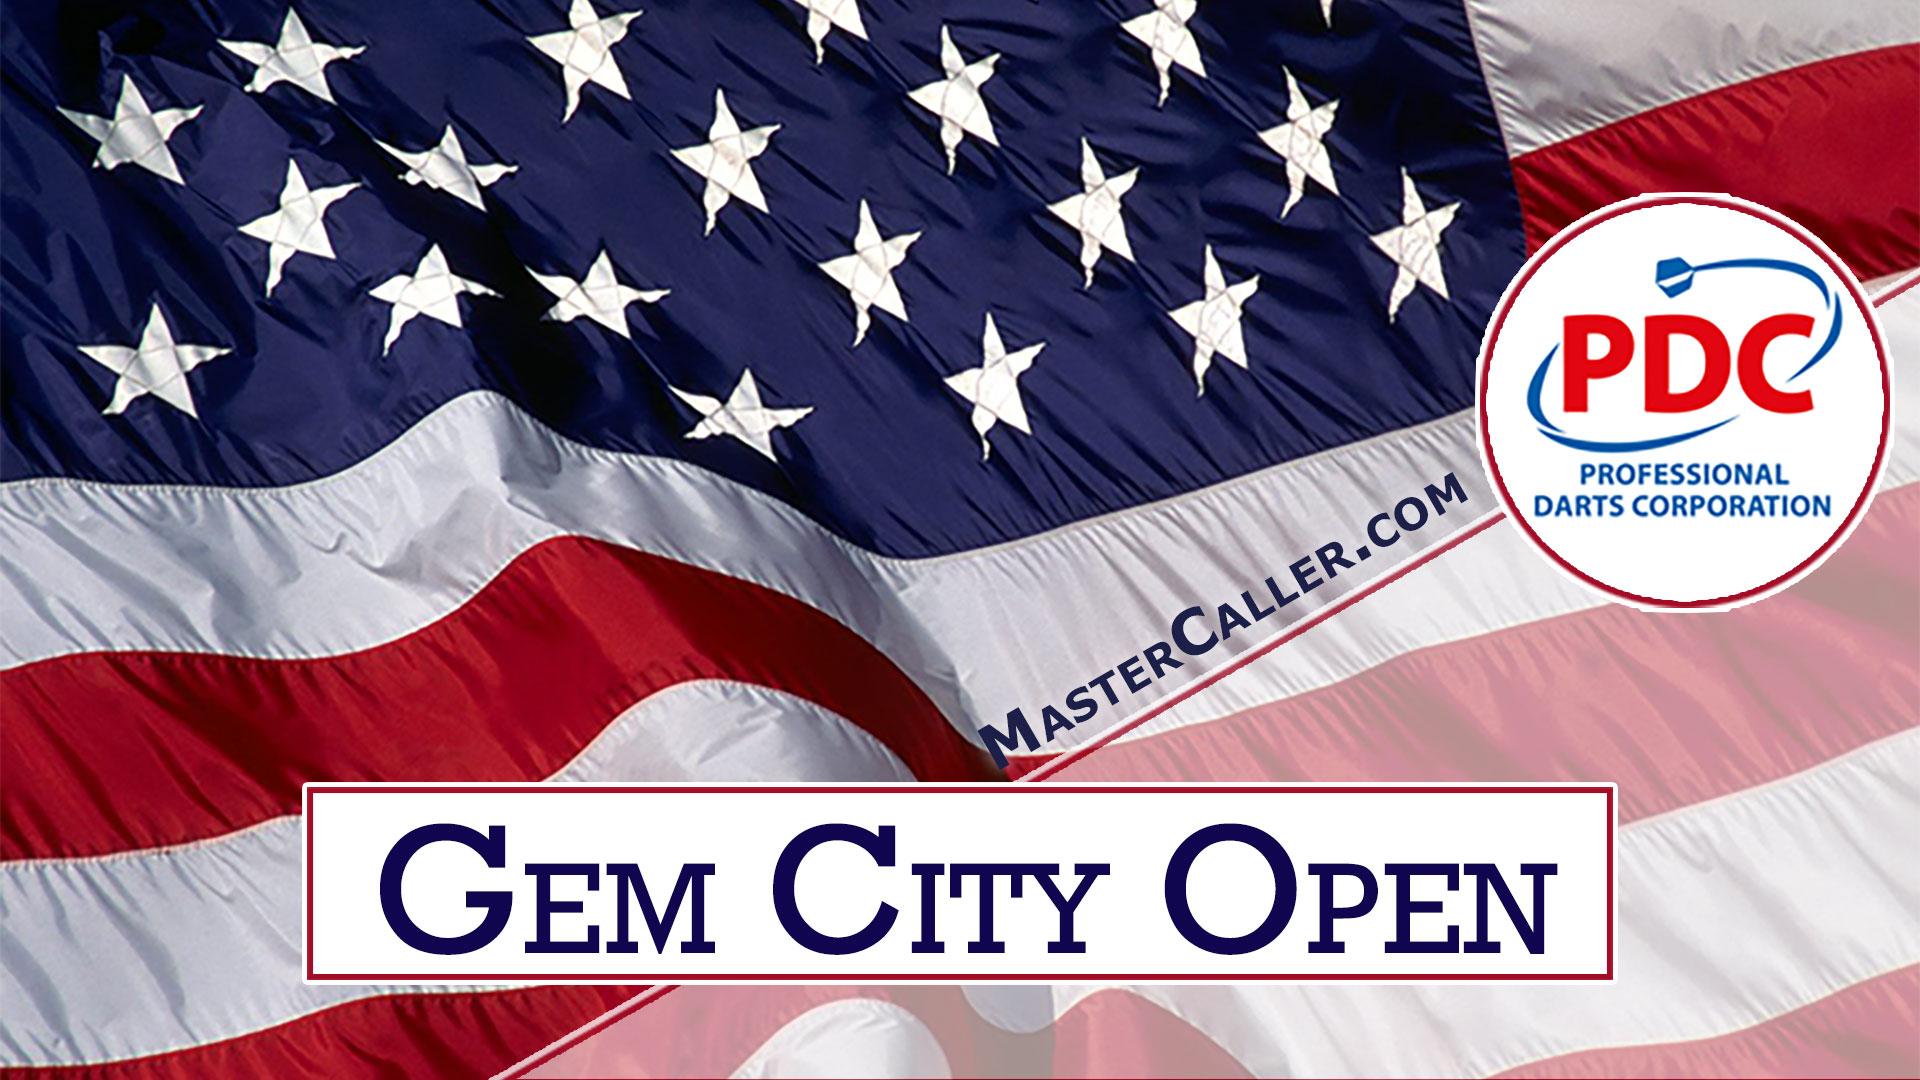 Gem City Open - 1996 Logo